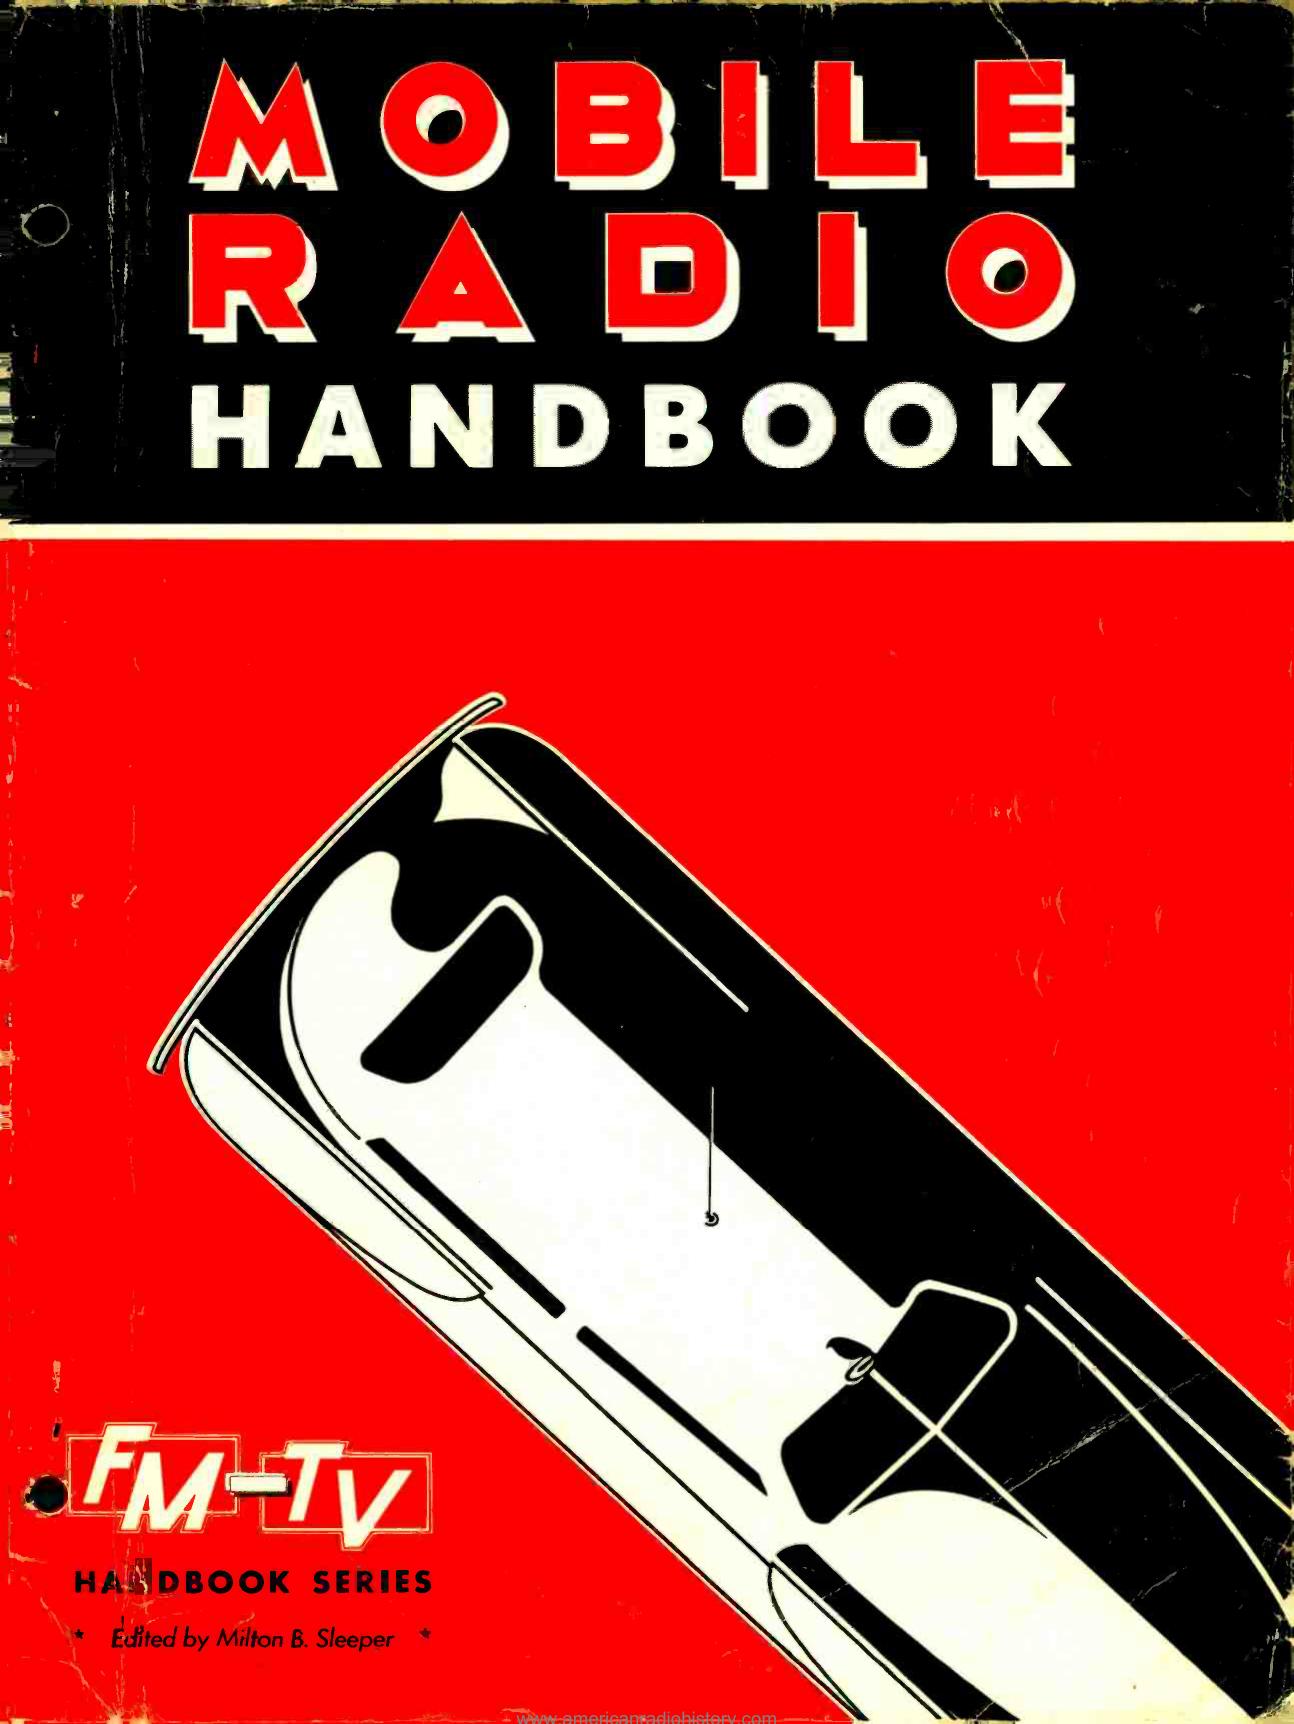 mobile radio handbook american radio history manualzz commobile radio handbook american radio history